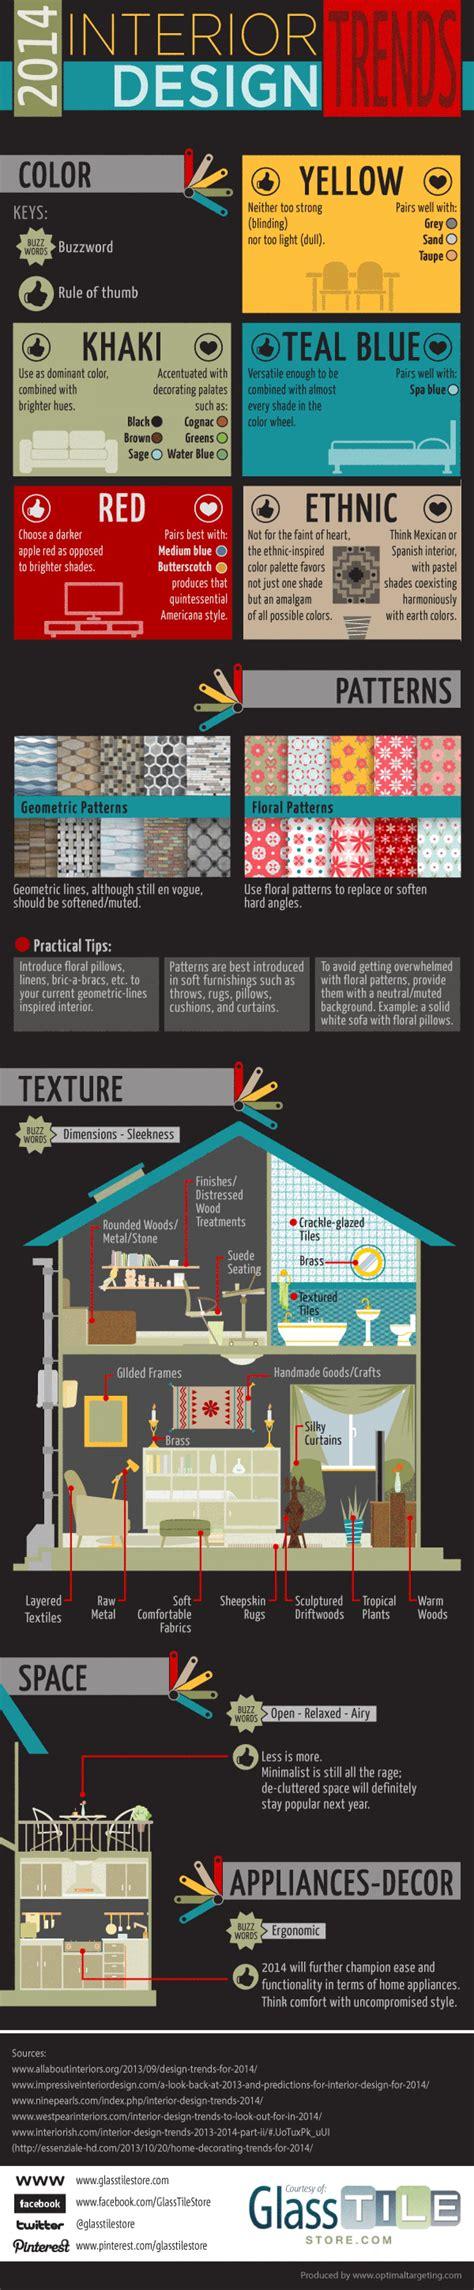 interior design trends in 2014 2014 interior design trends visual ly